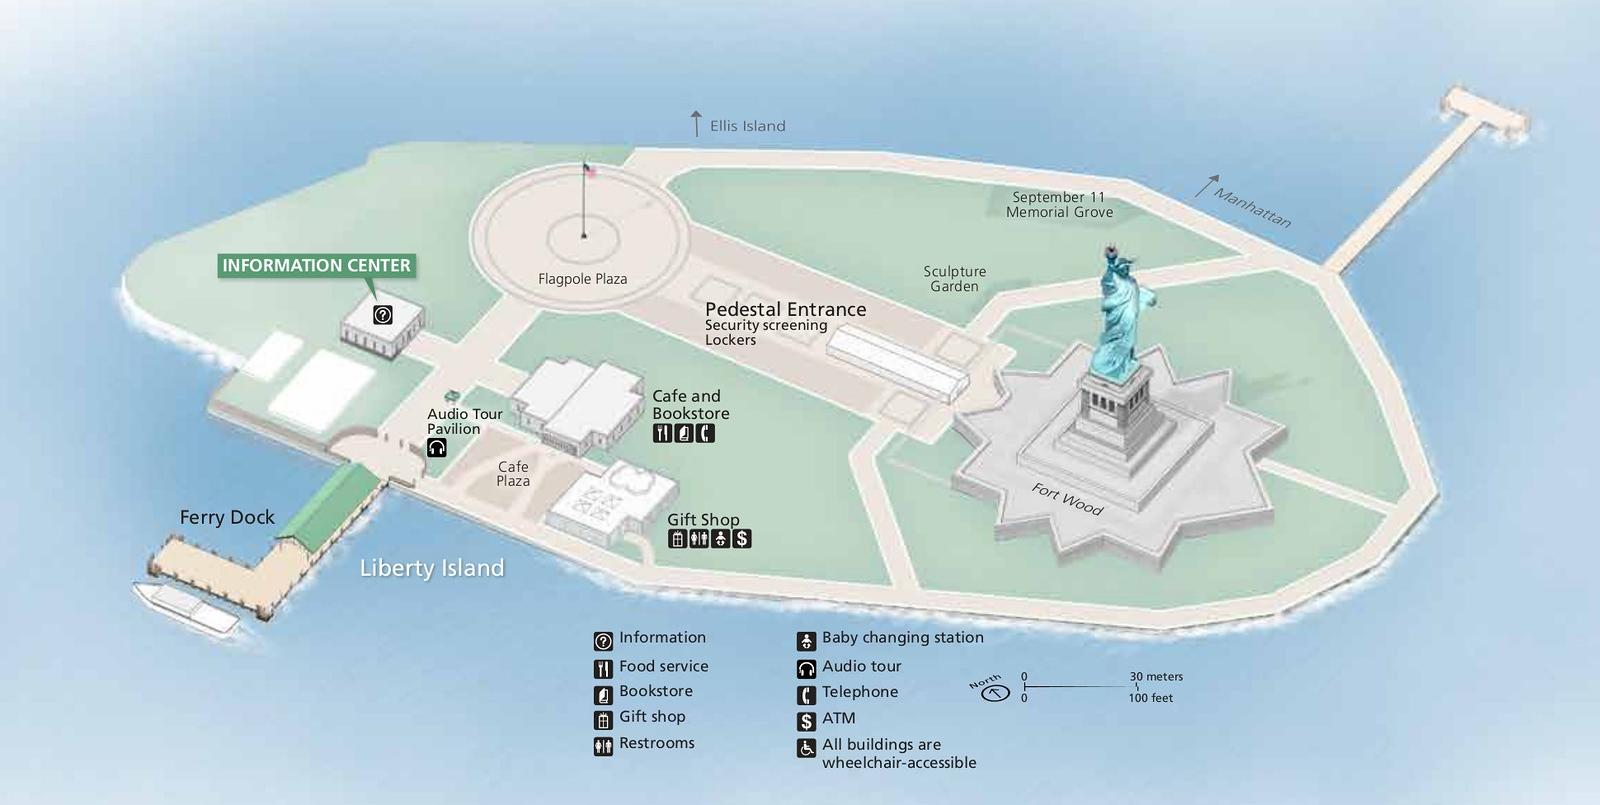 Statue of Liberty National Monument -- Liberty Island